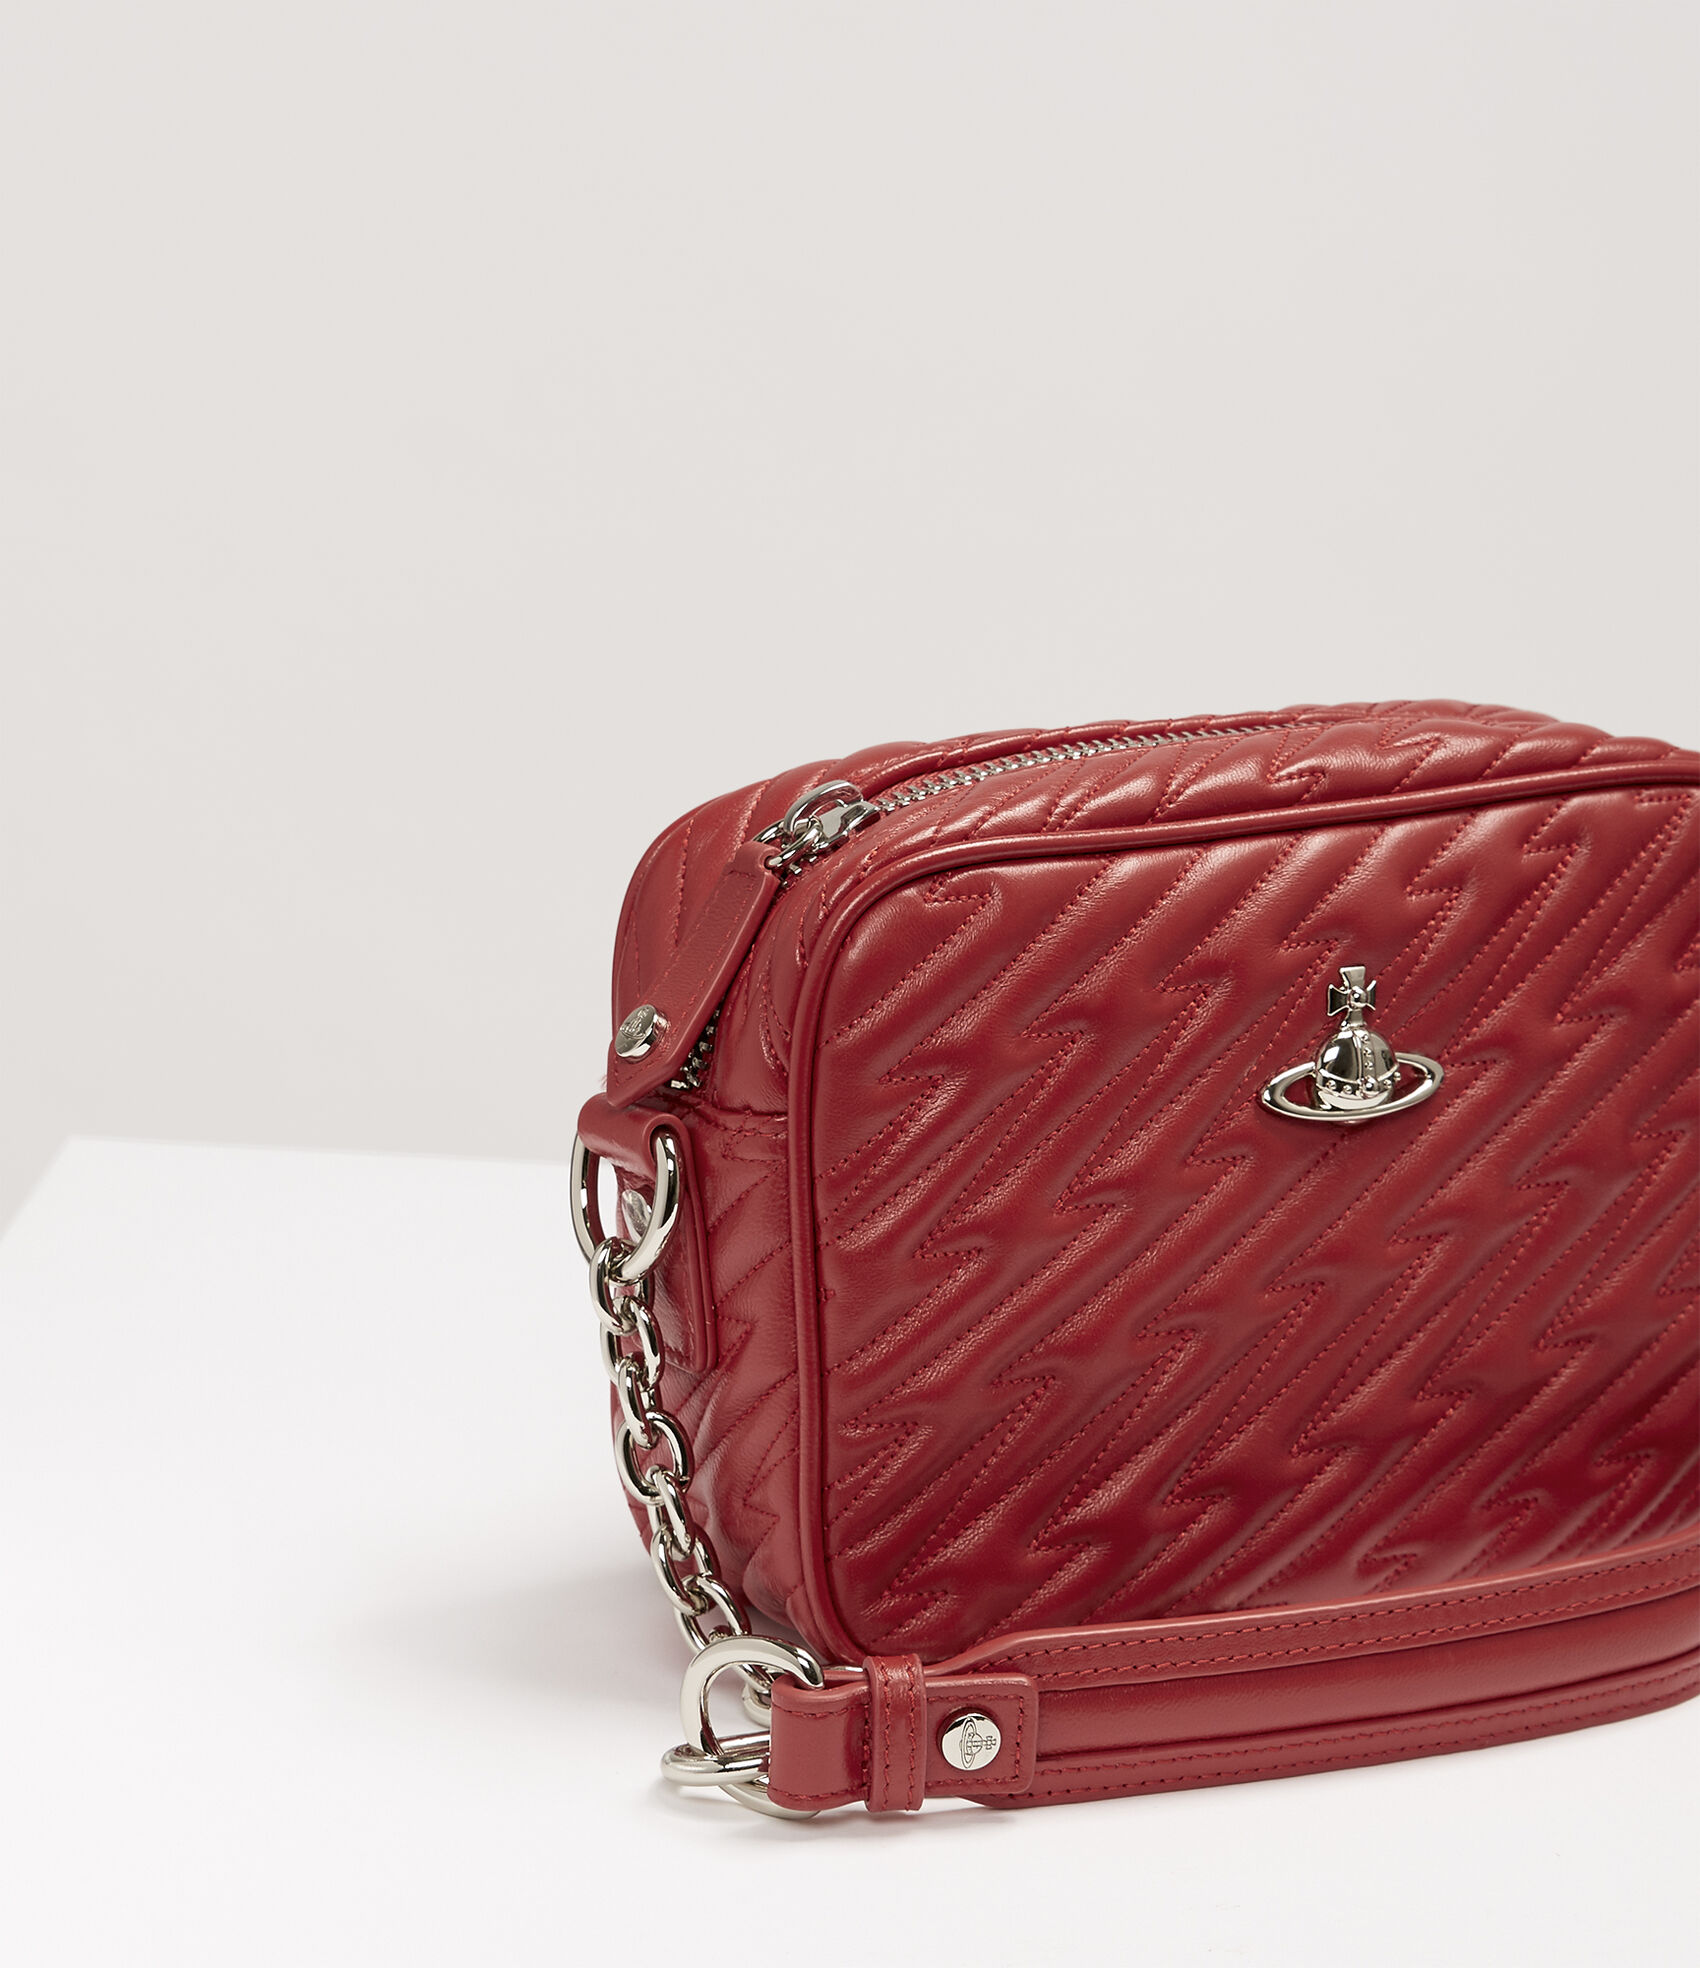 1968e2ab7b Coventry Bag Red | Women's Handbags | Vivienne Westwood